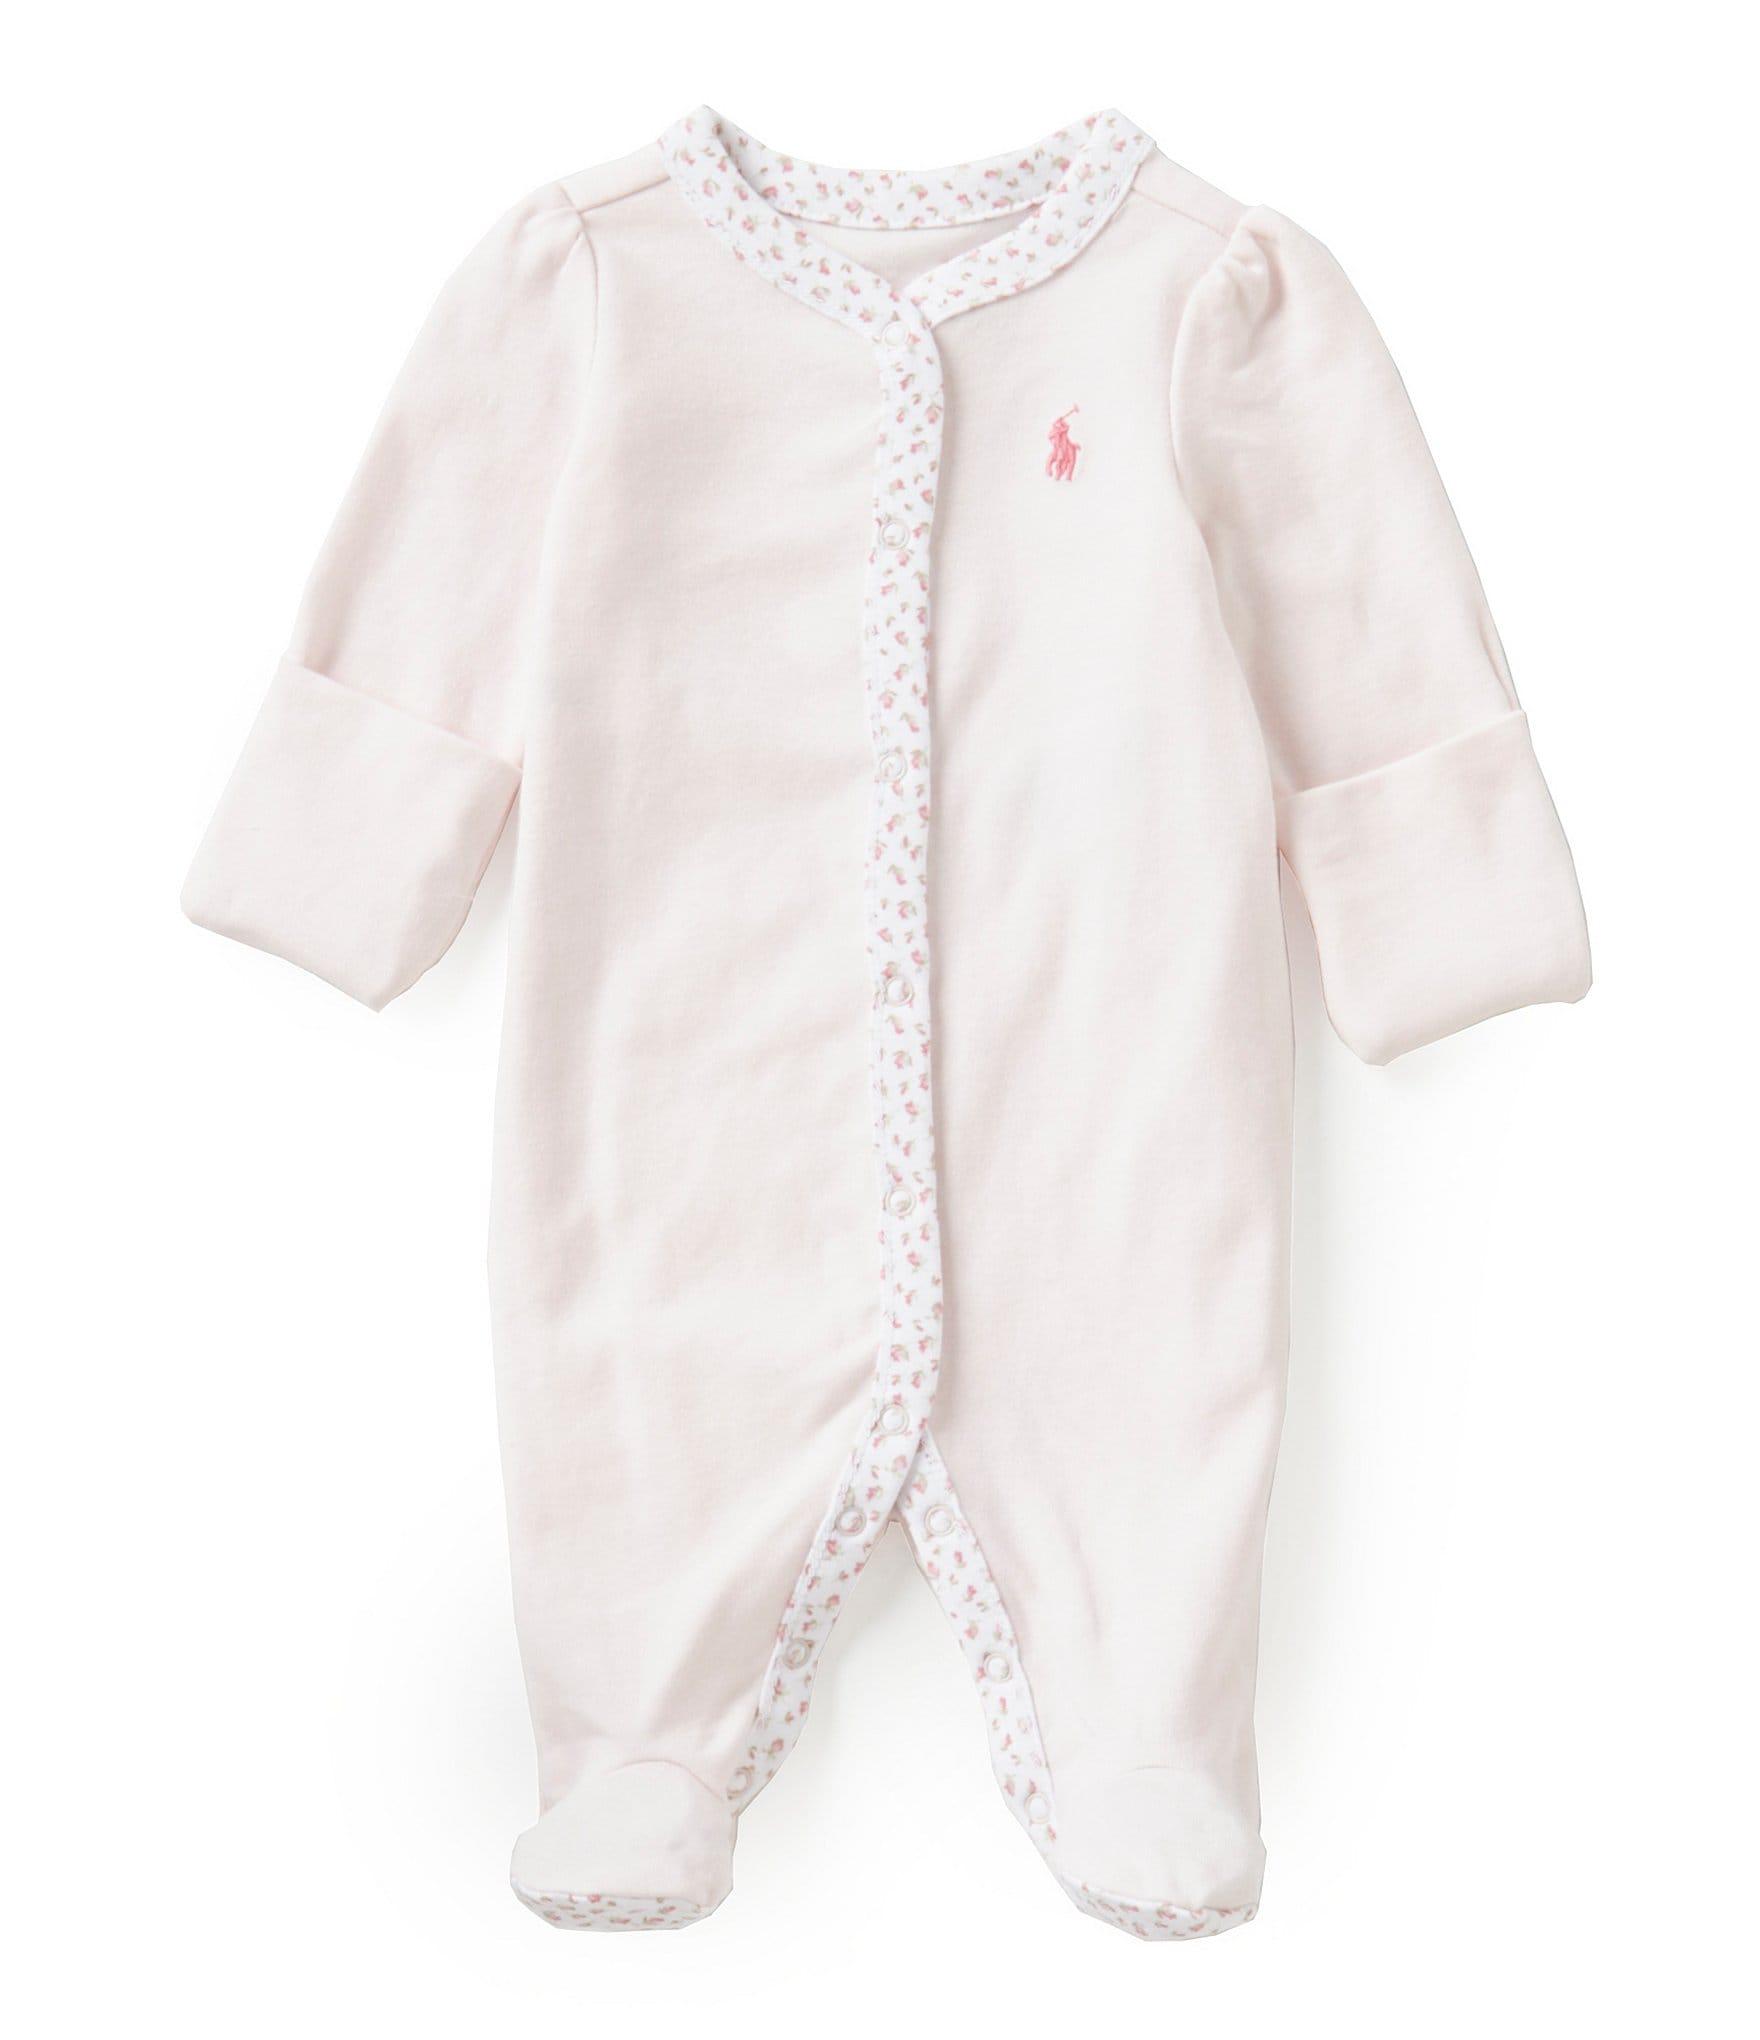 ae6648e2eff90 Ralph LaurenChildrenswear Baby Girls Newborn-9 Months Floral-Trim Coverall